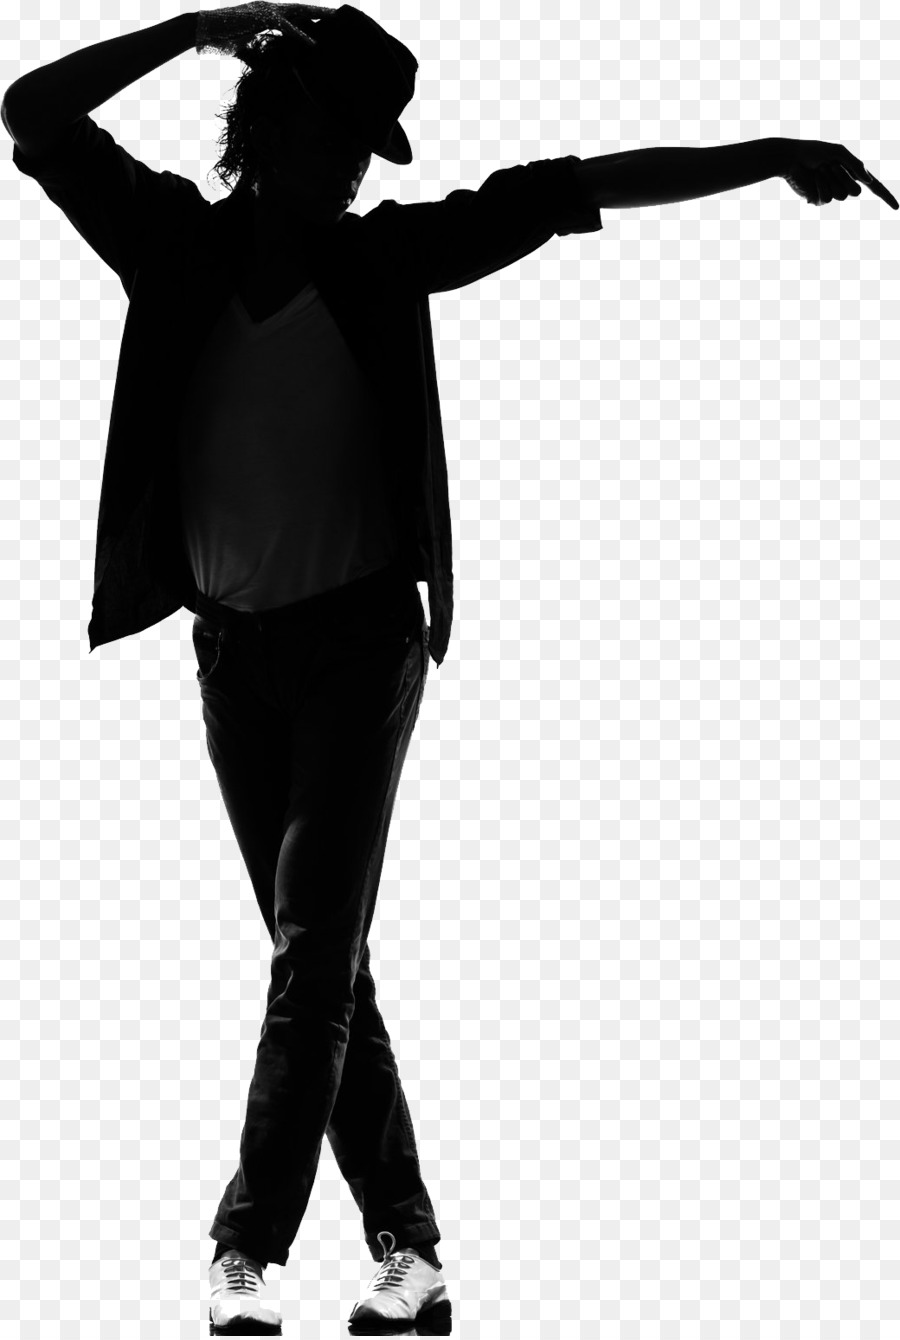 Michael Jackson Moonwalk clipart - Silhouette, Drawing ... banner stock